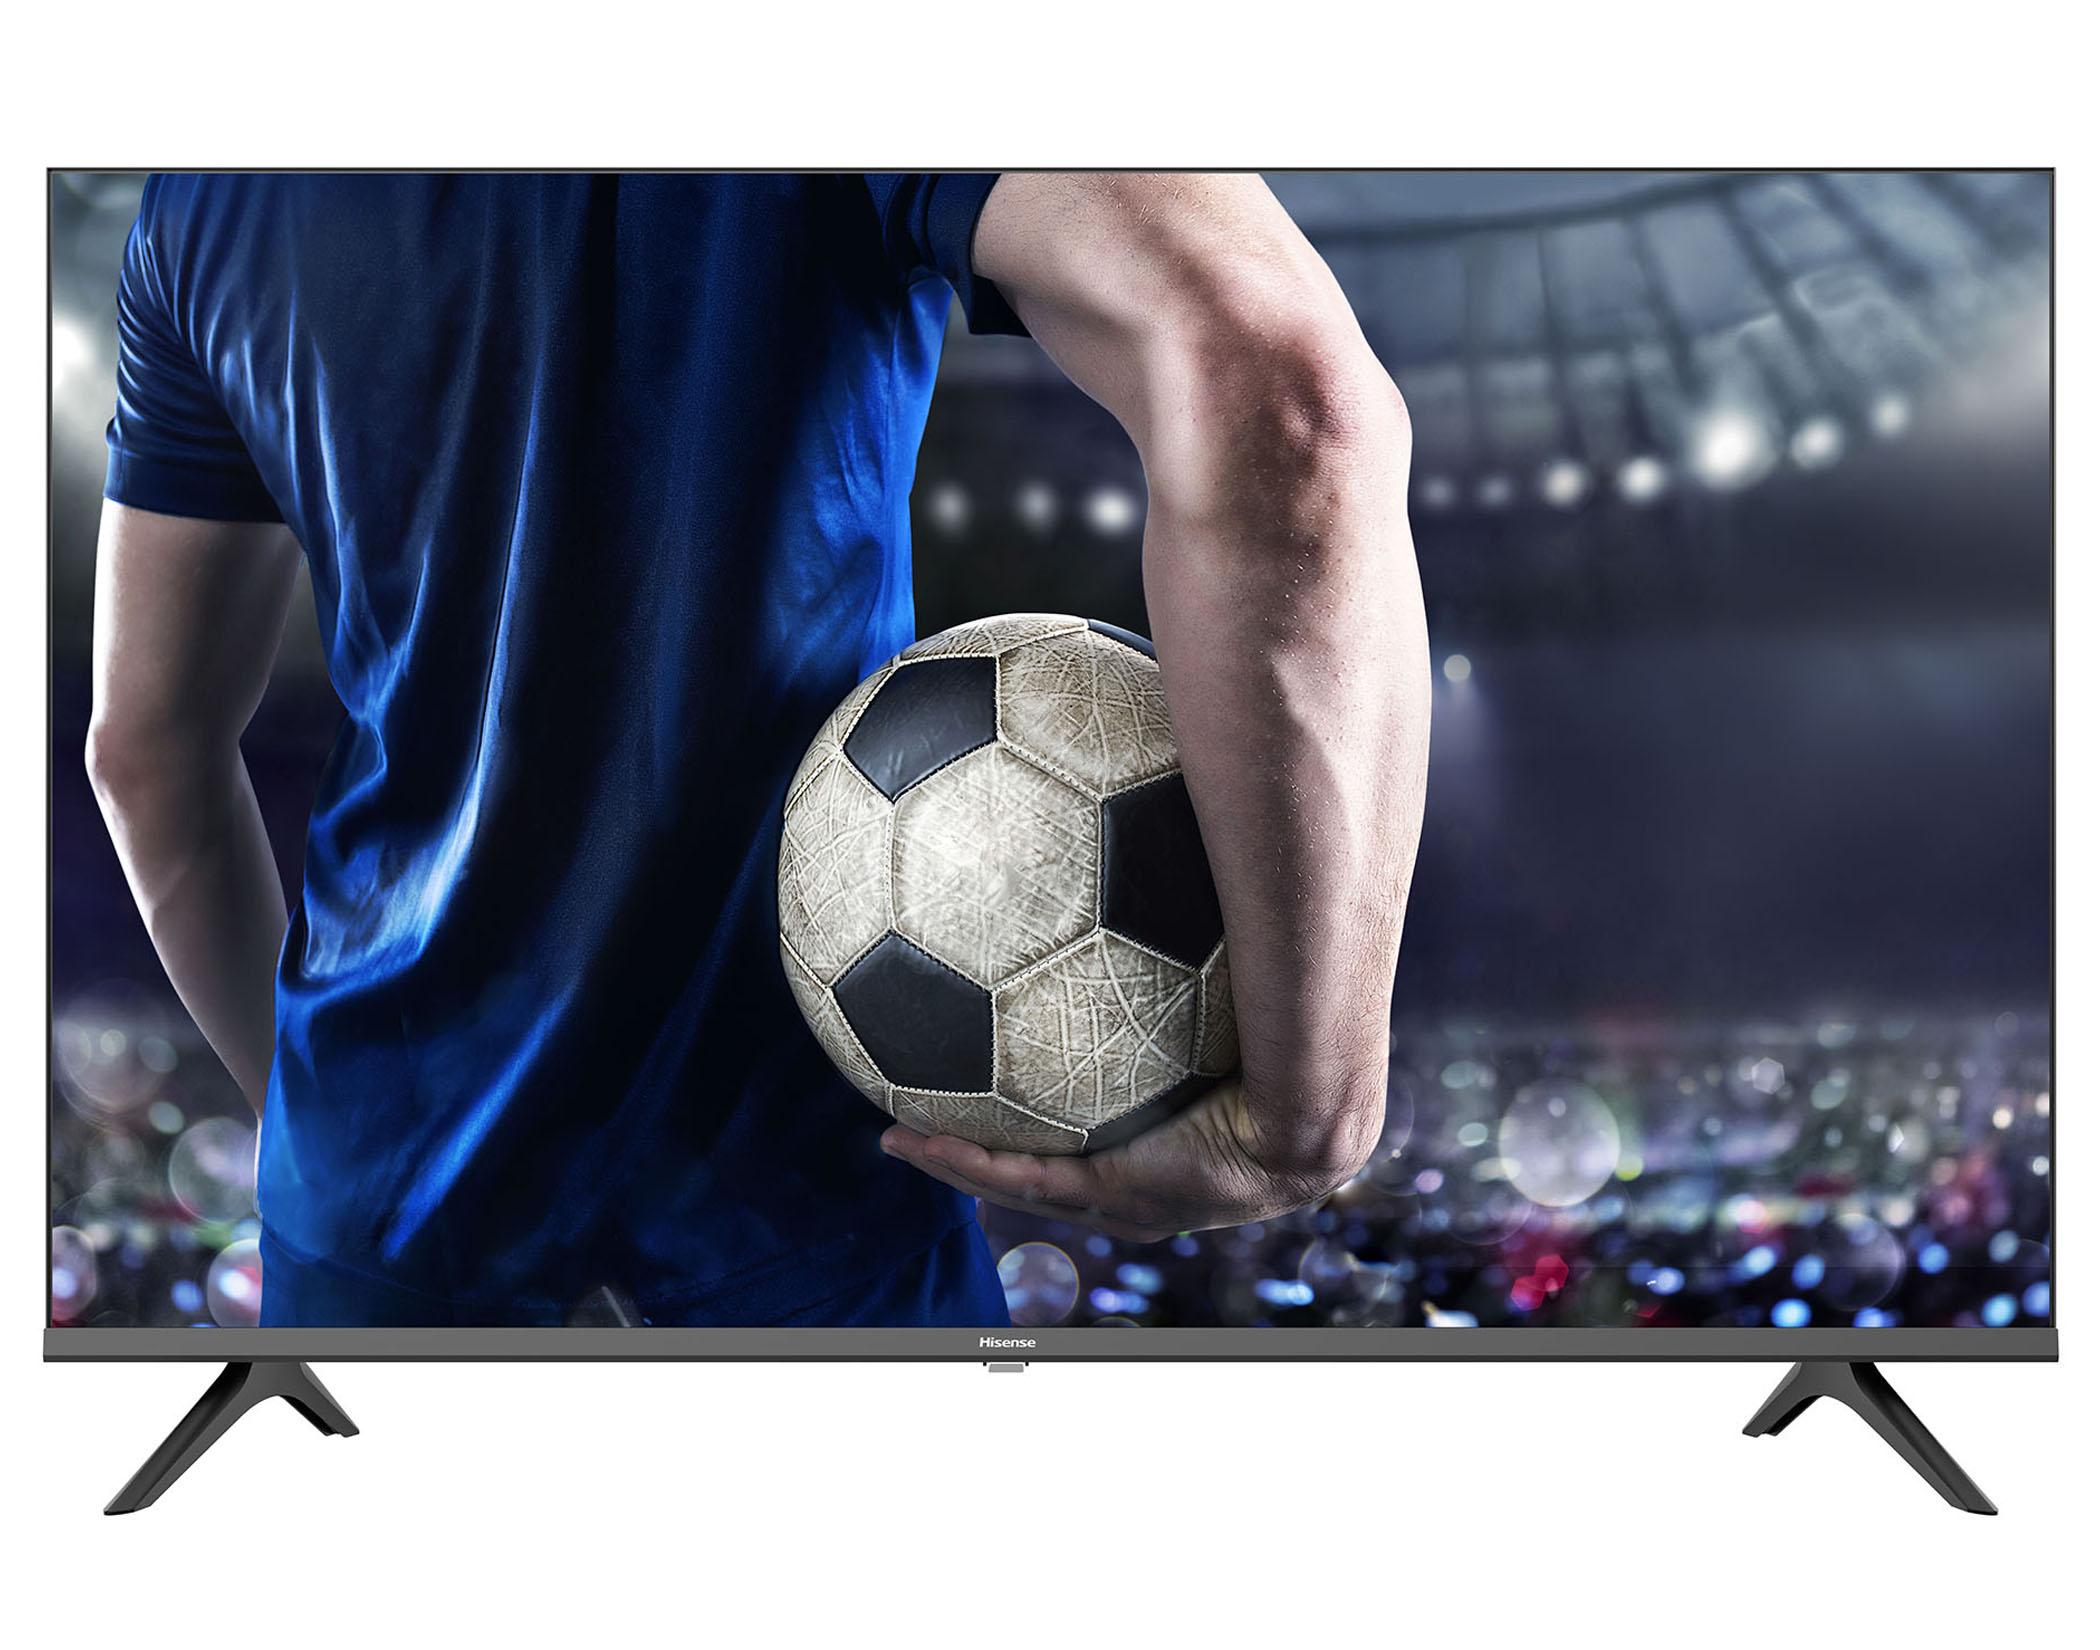 Hisense 40S4 32S4 FULL HD TV SERIES 4 main